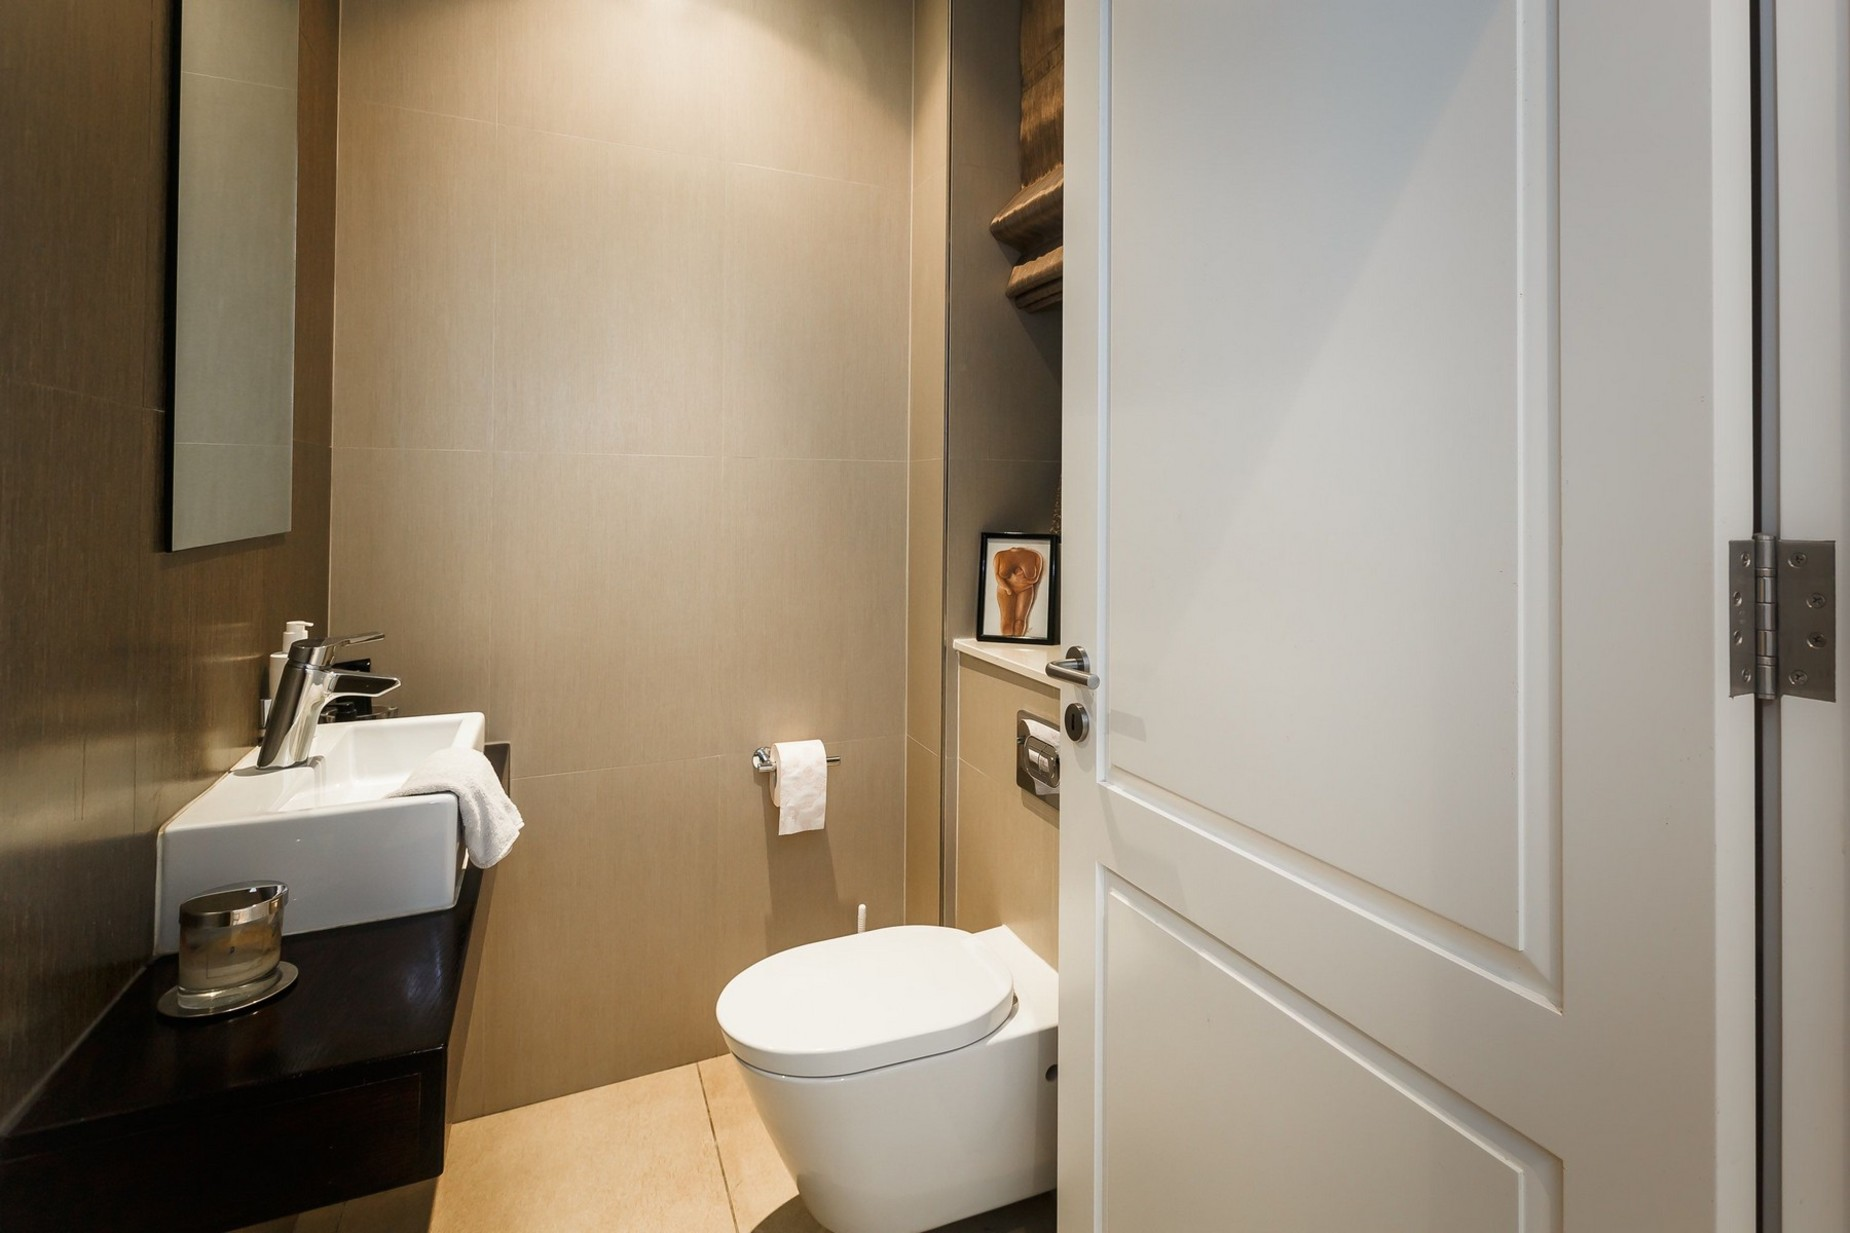 3 bed Apartment For Rent in Sliema, Sliema - thumb 21